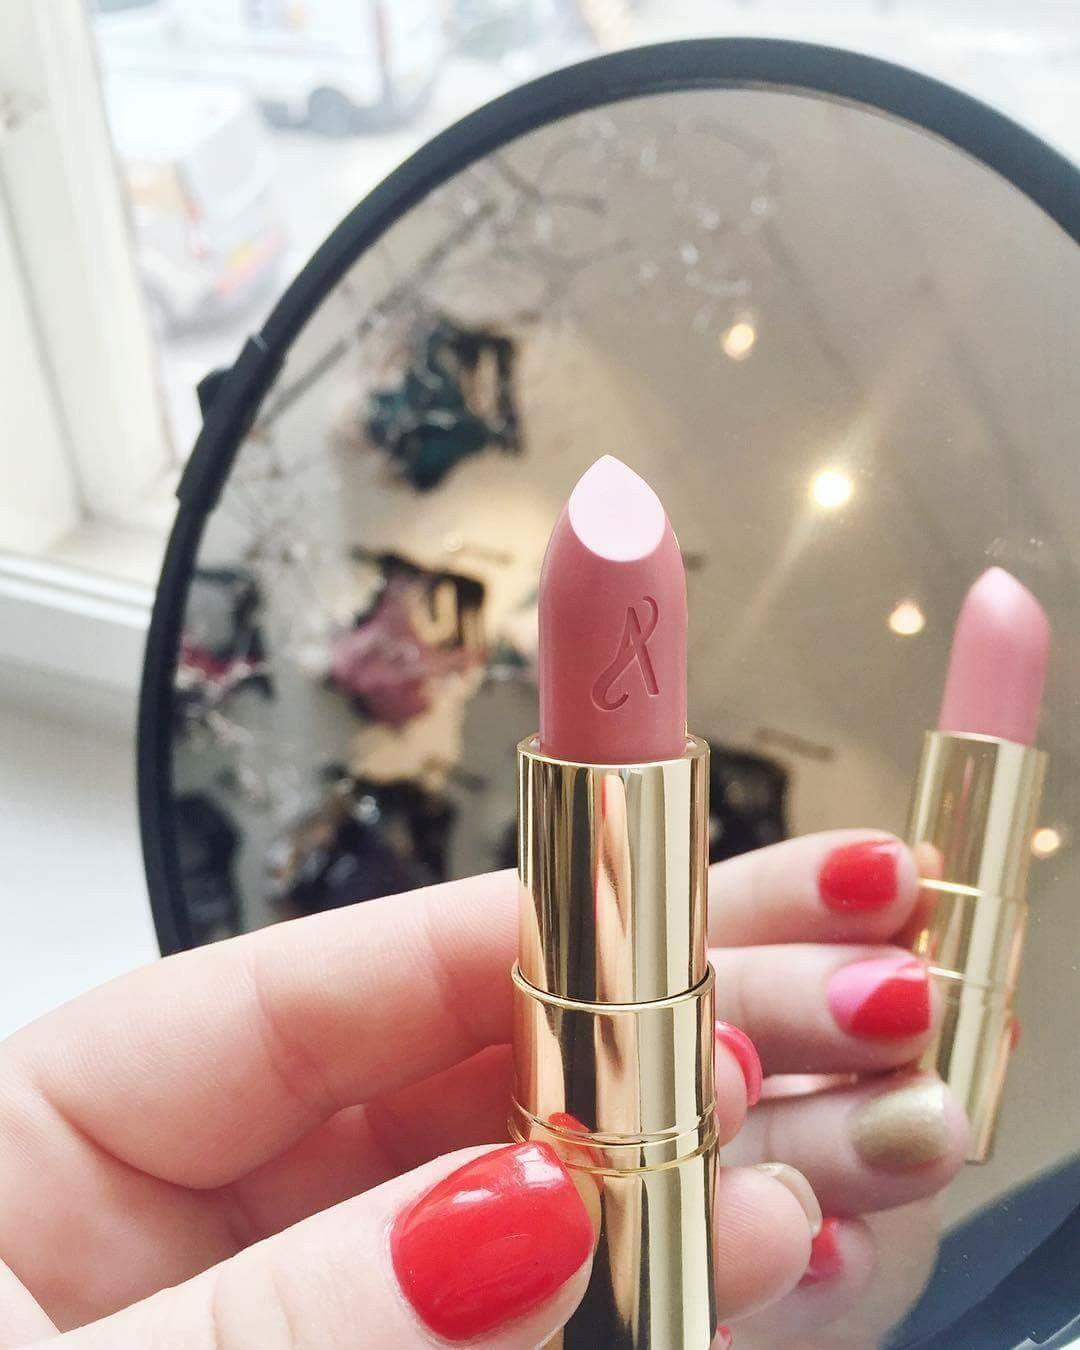 Artistry Lipstick Artistry Amway Artistry Makeup Artistry